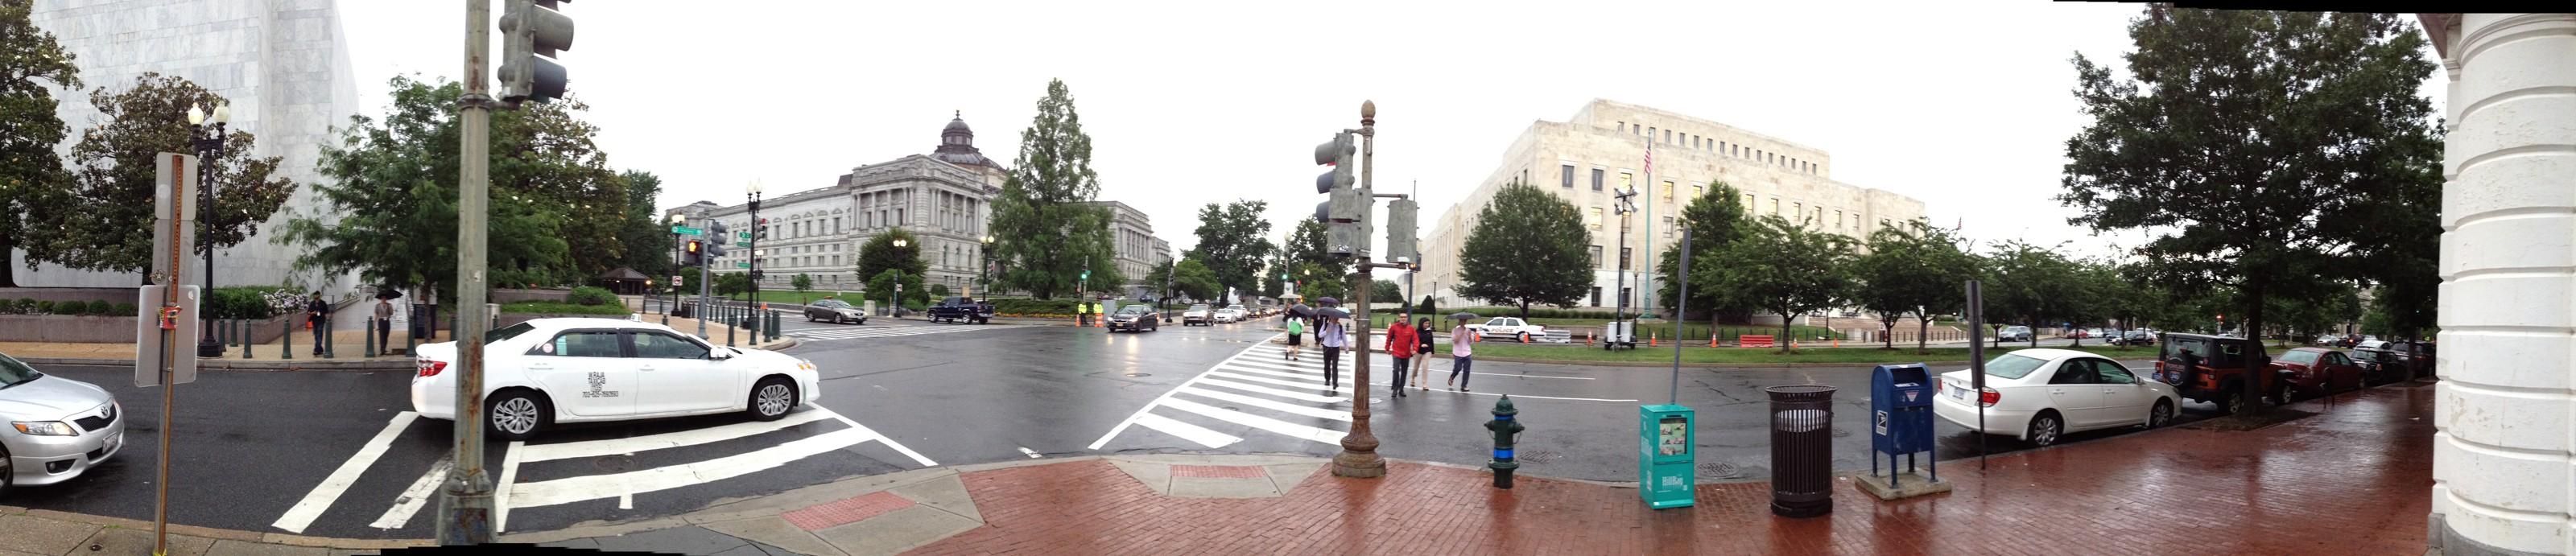 Washington DC 2013